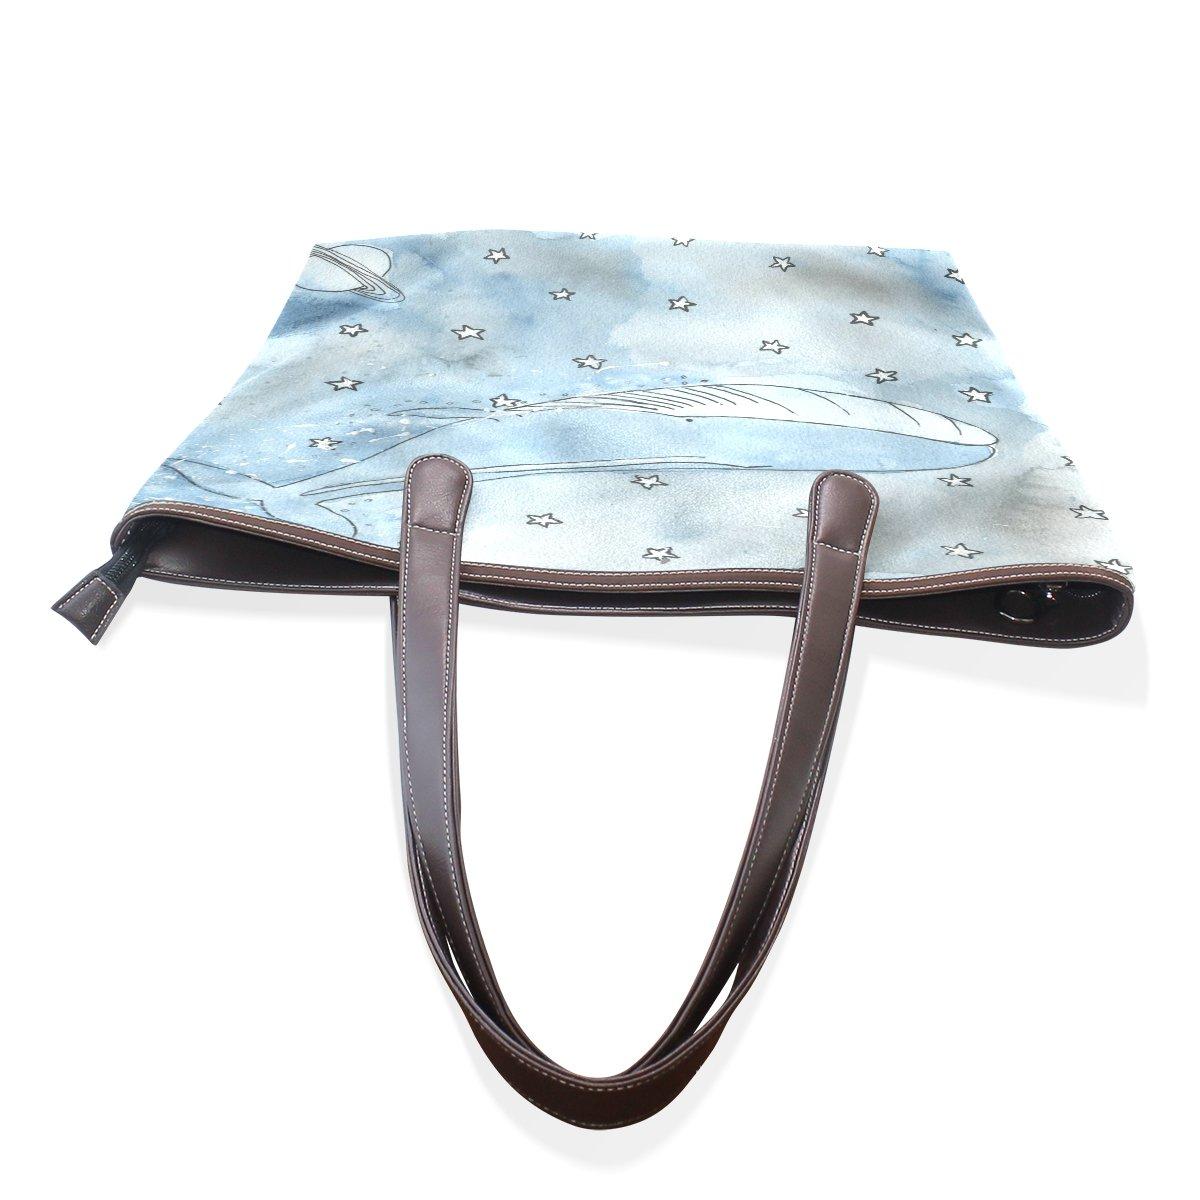 Mr.Weng Household Cartoon Whale And Starry Sky Lady Handbag Tote Bag Zipper Shoulder Bag